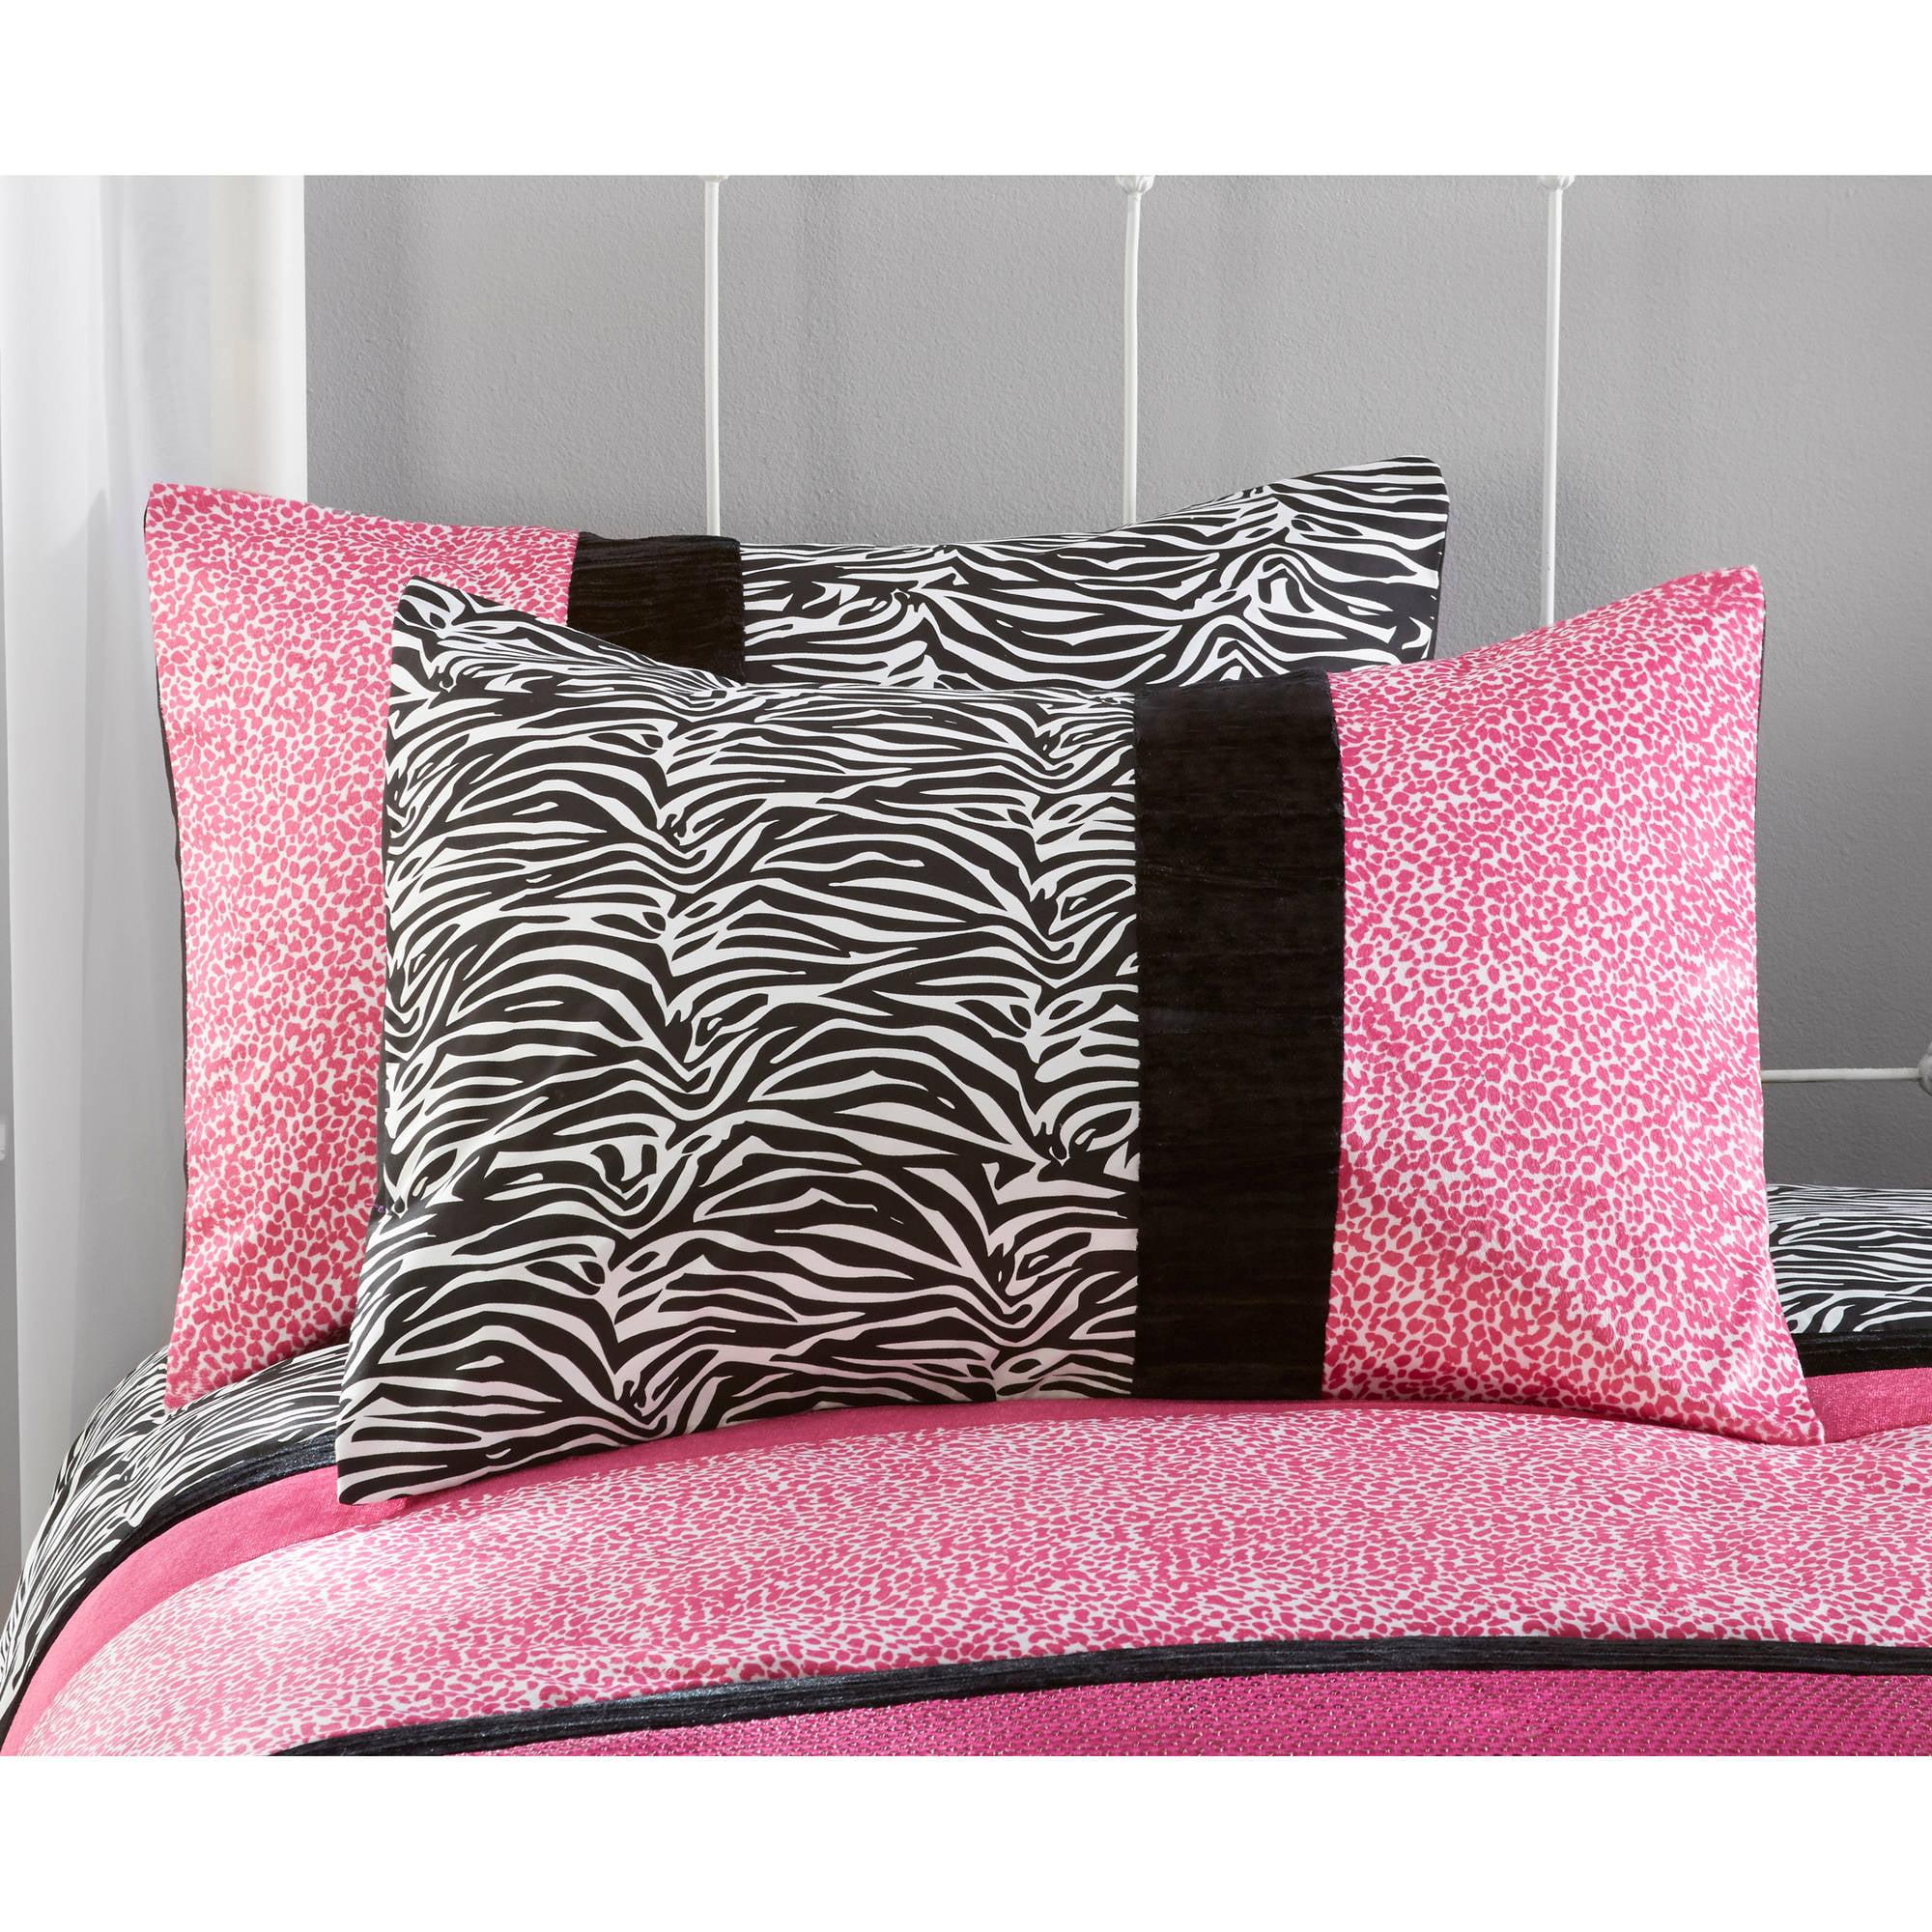 Light blue zebra print bedding - Light Blue Zebra Print Bedding 50